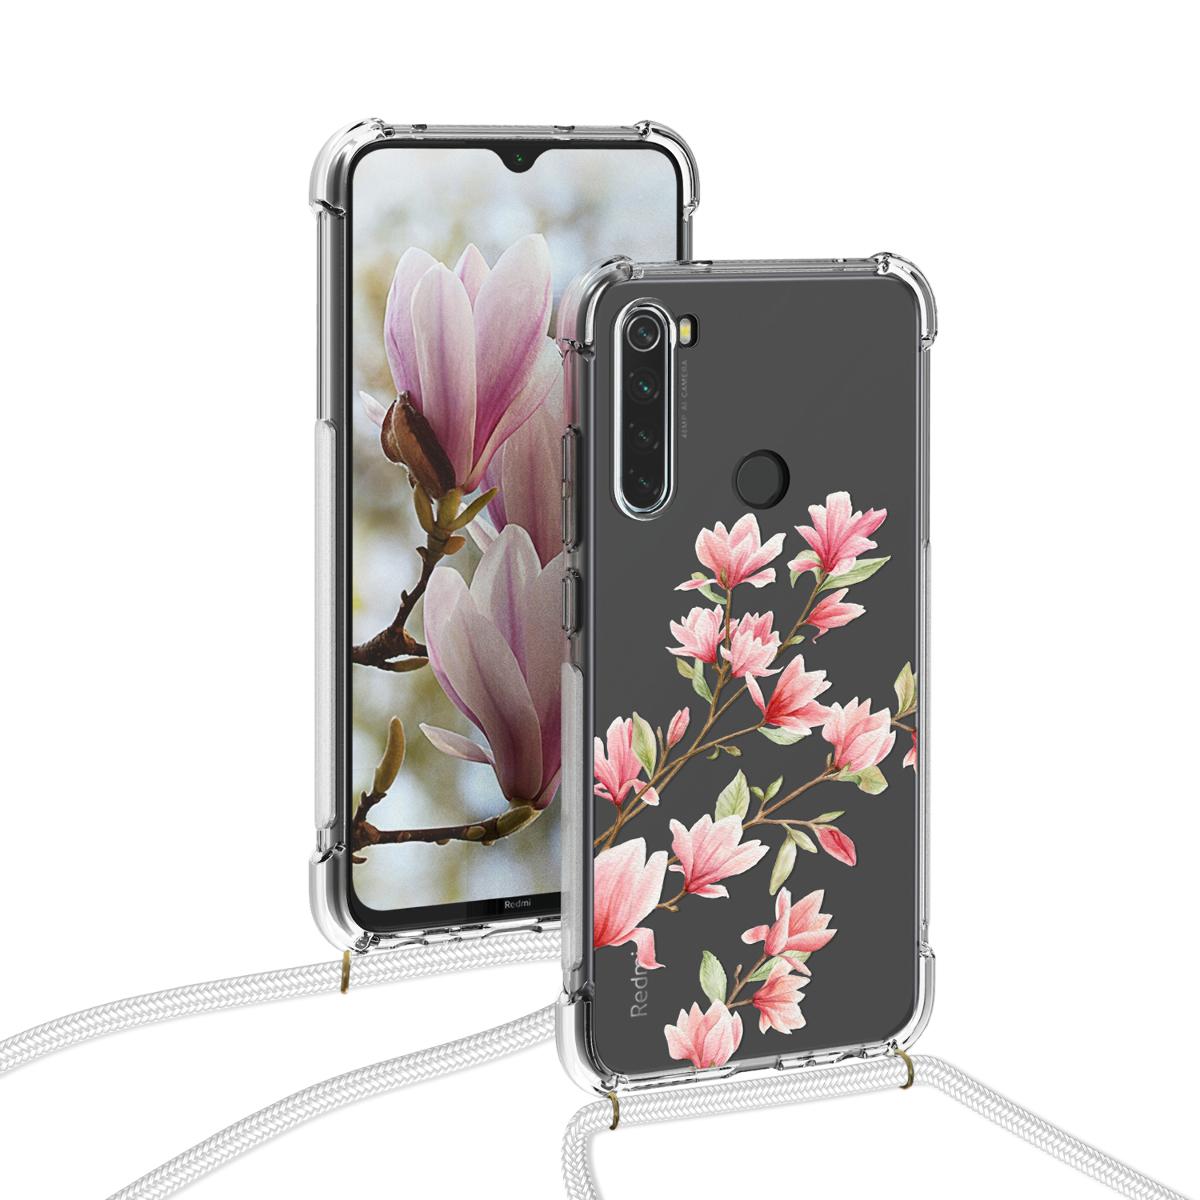 KW Θήκη Σιλικόνης με Λουράκι Λαιμού Xiaomi Redmi Note 8 - Magnolias - Light Pink / White / Transparent (50986.02)